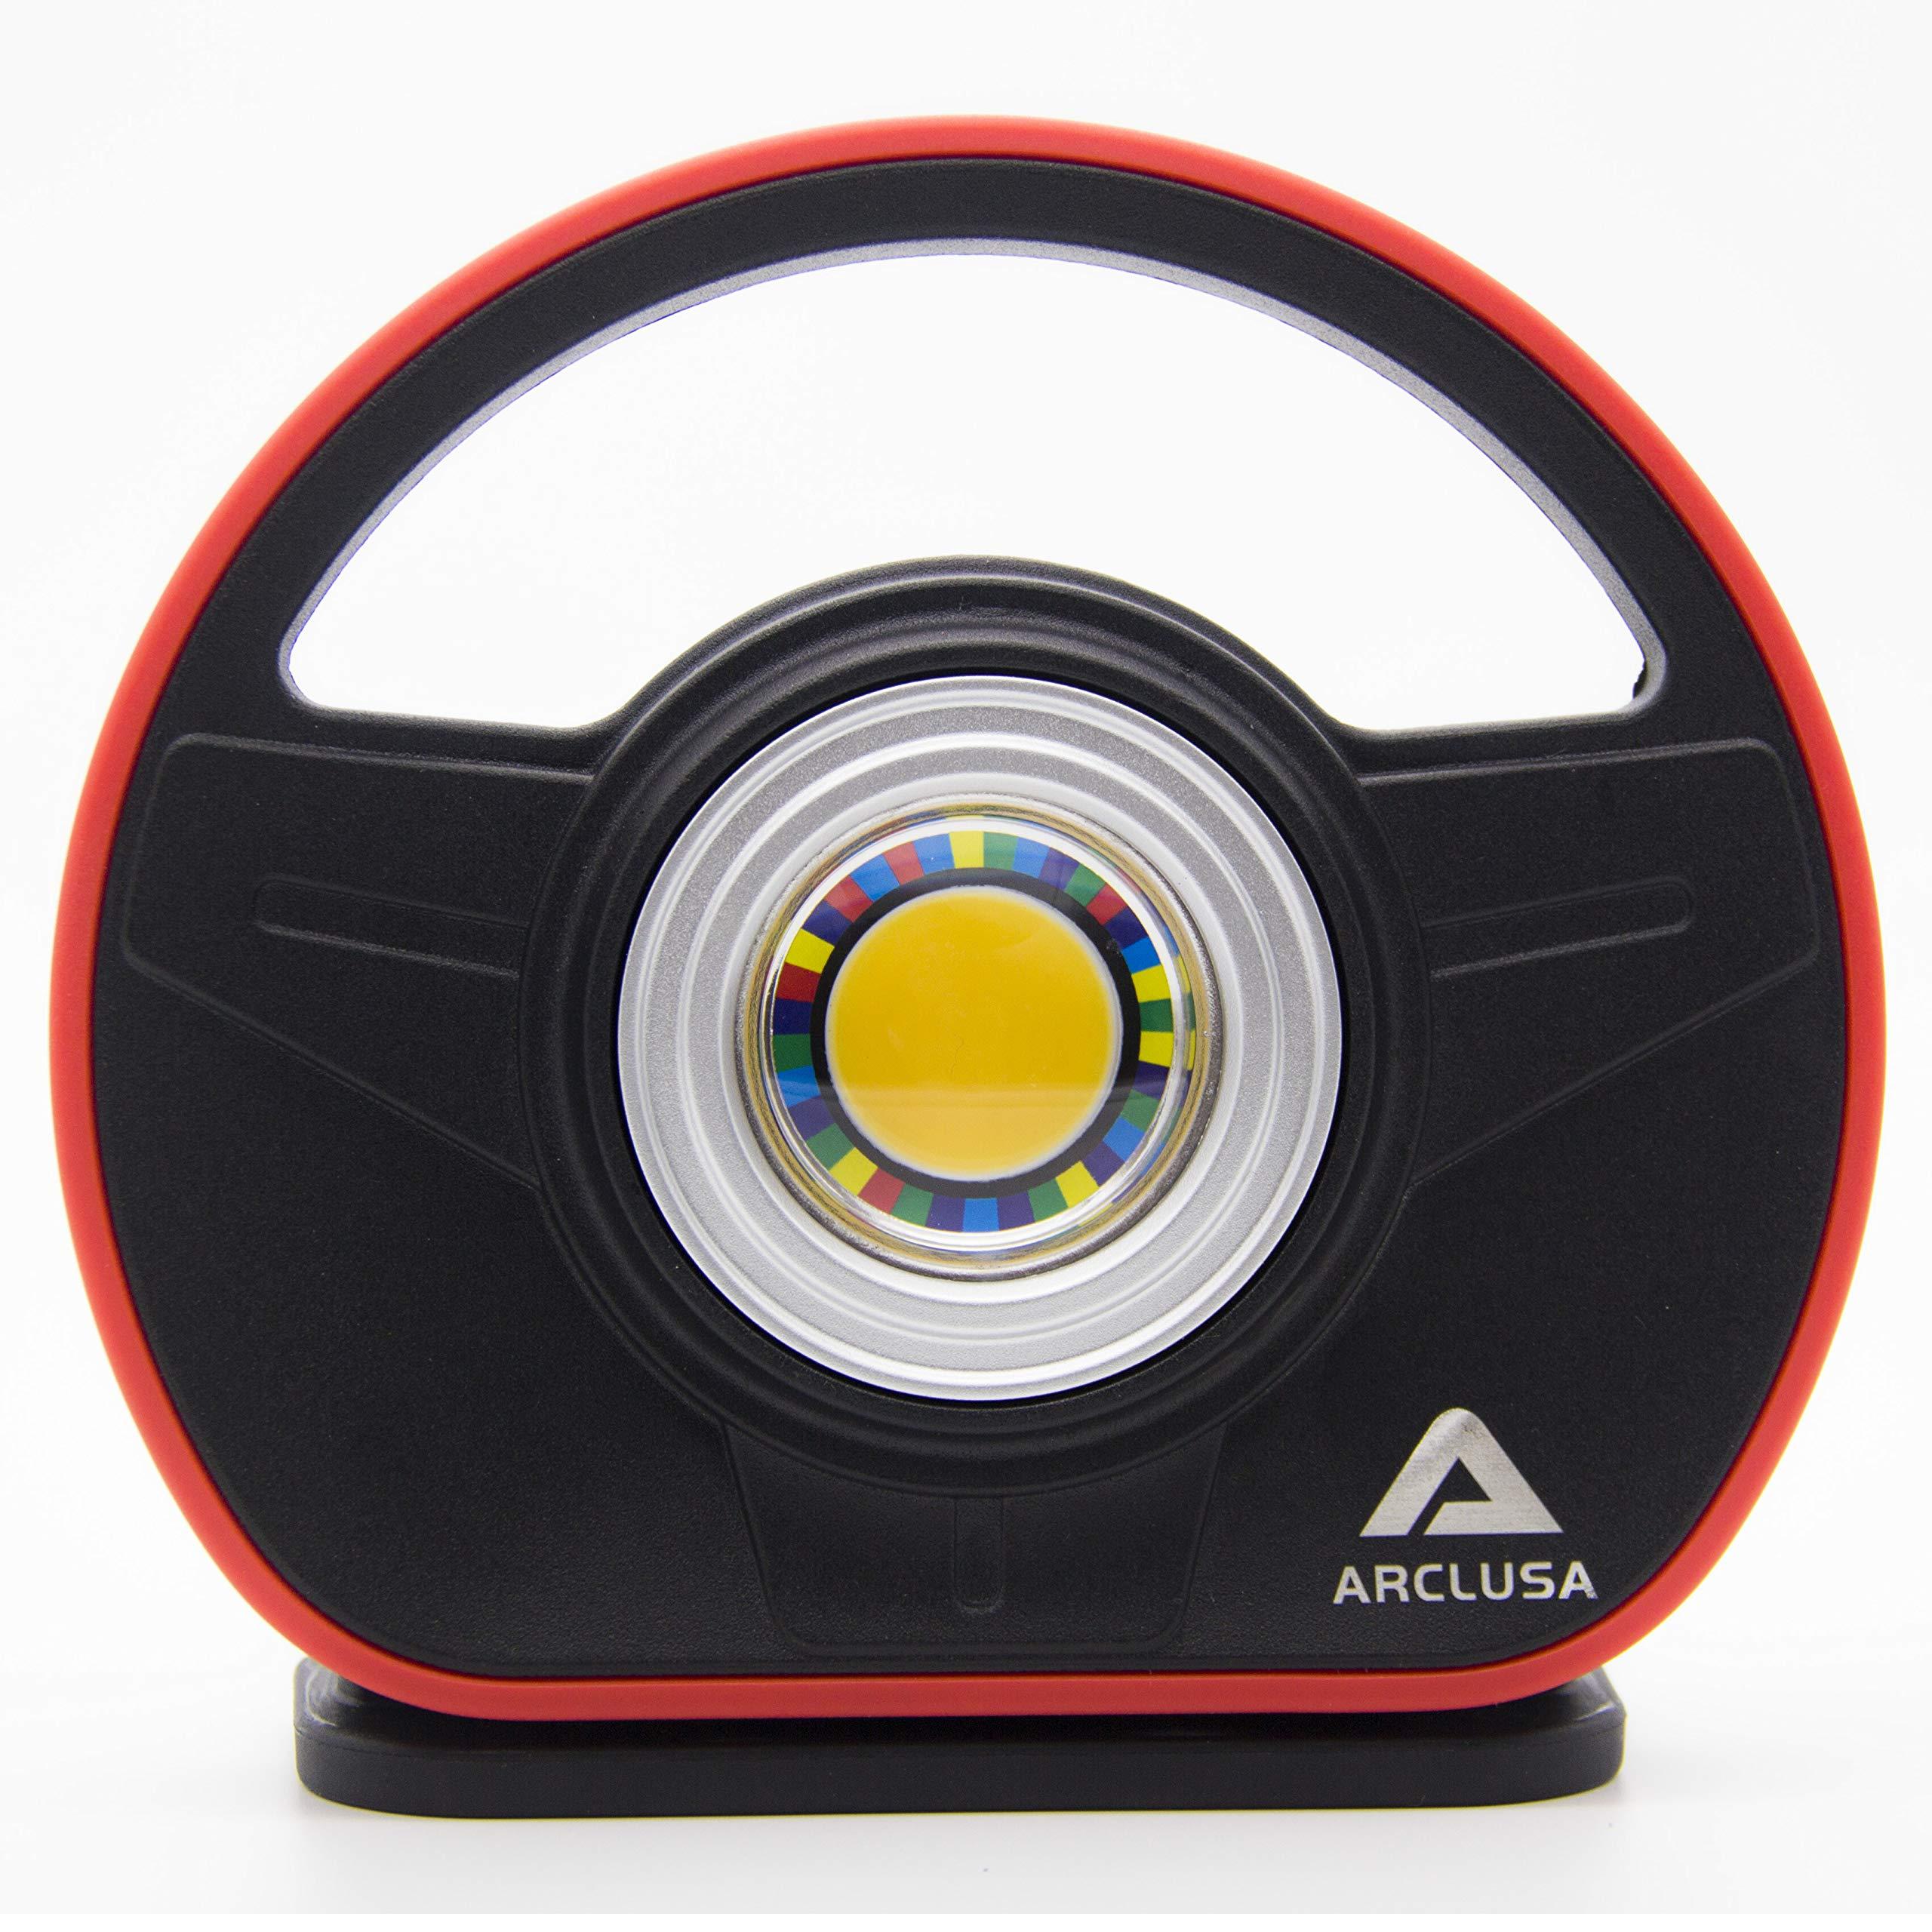 Arclusa COB LED Rechargeable Sunlight Color Match Paint Work Light Adjustable Holder Magnet Bottom Flood Light(1000 Lumen Color Match) by Arclusa (Image #4)